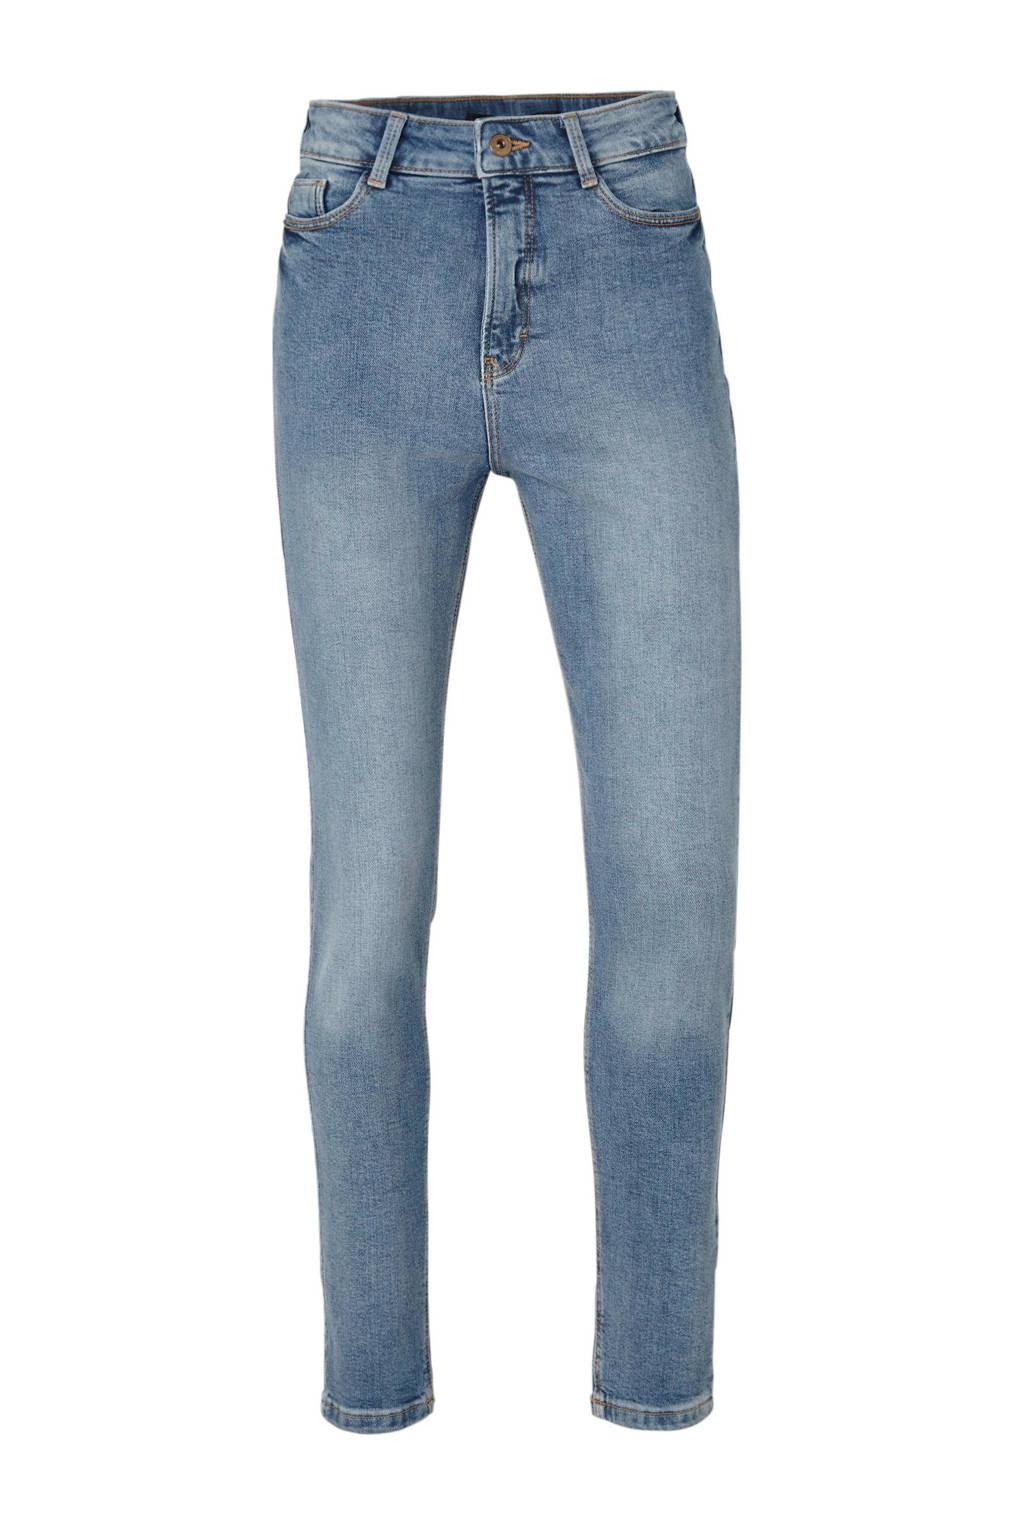 C&A Clockhouse skinny jeans, Stonewashed